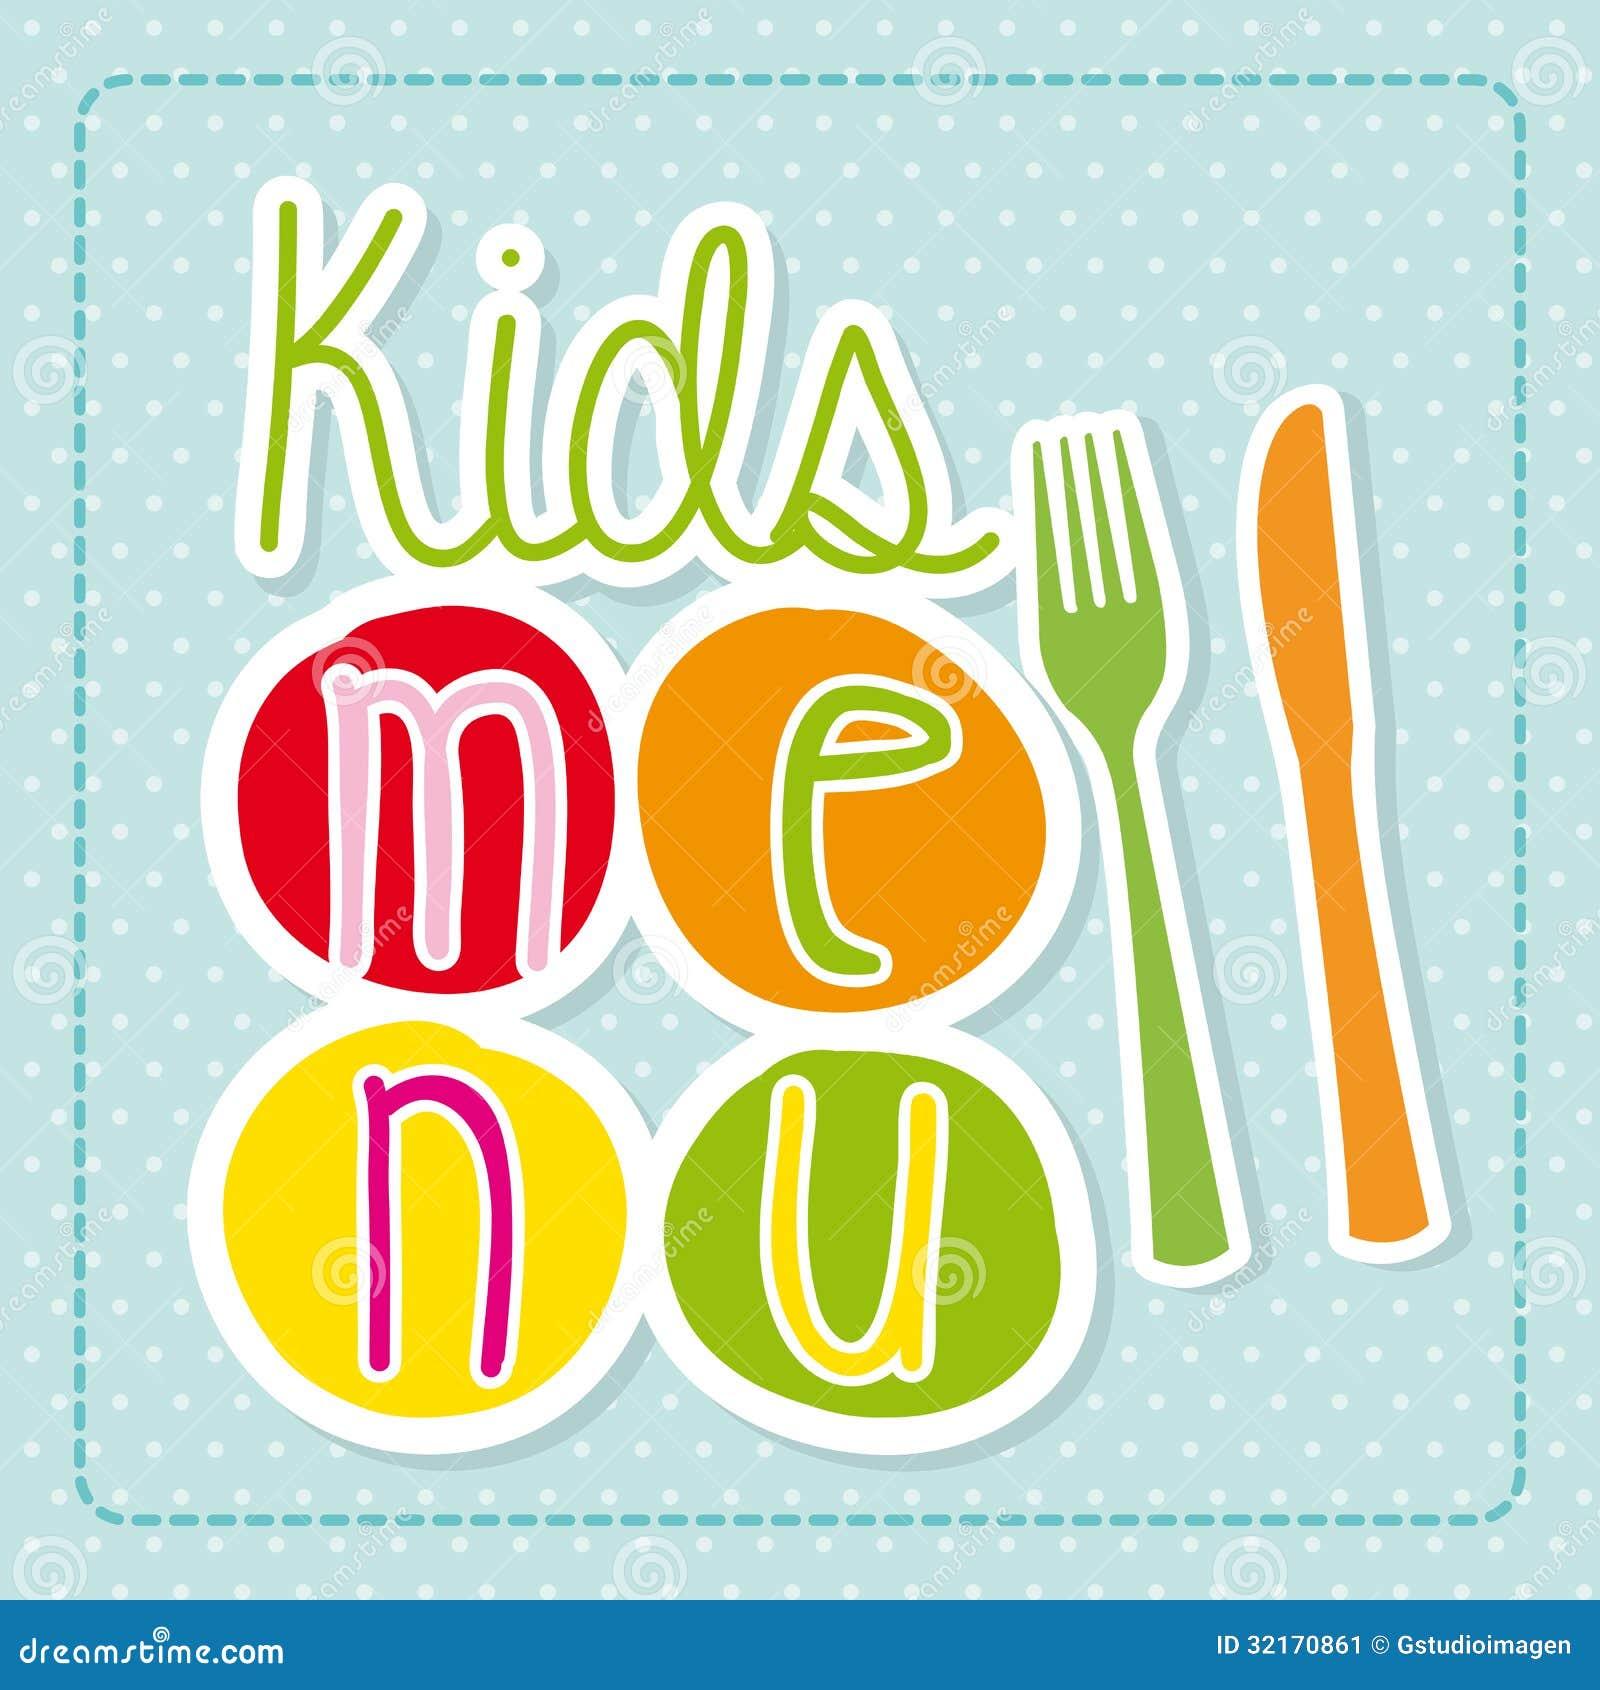 Kids Food Delivery Service